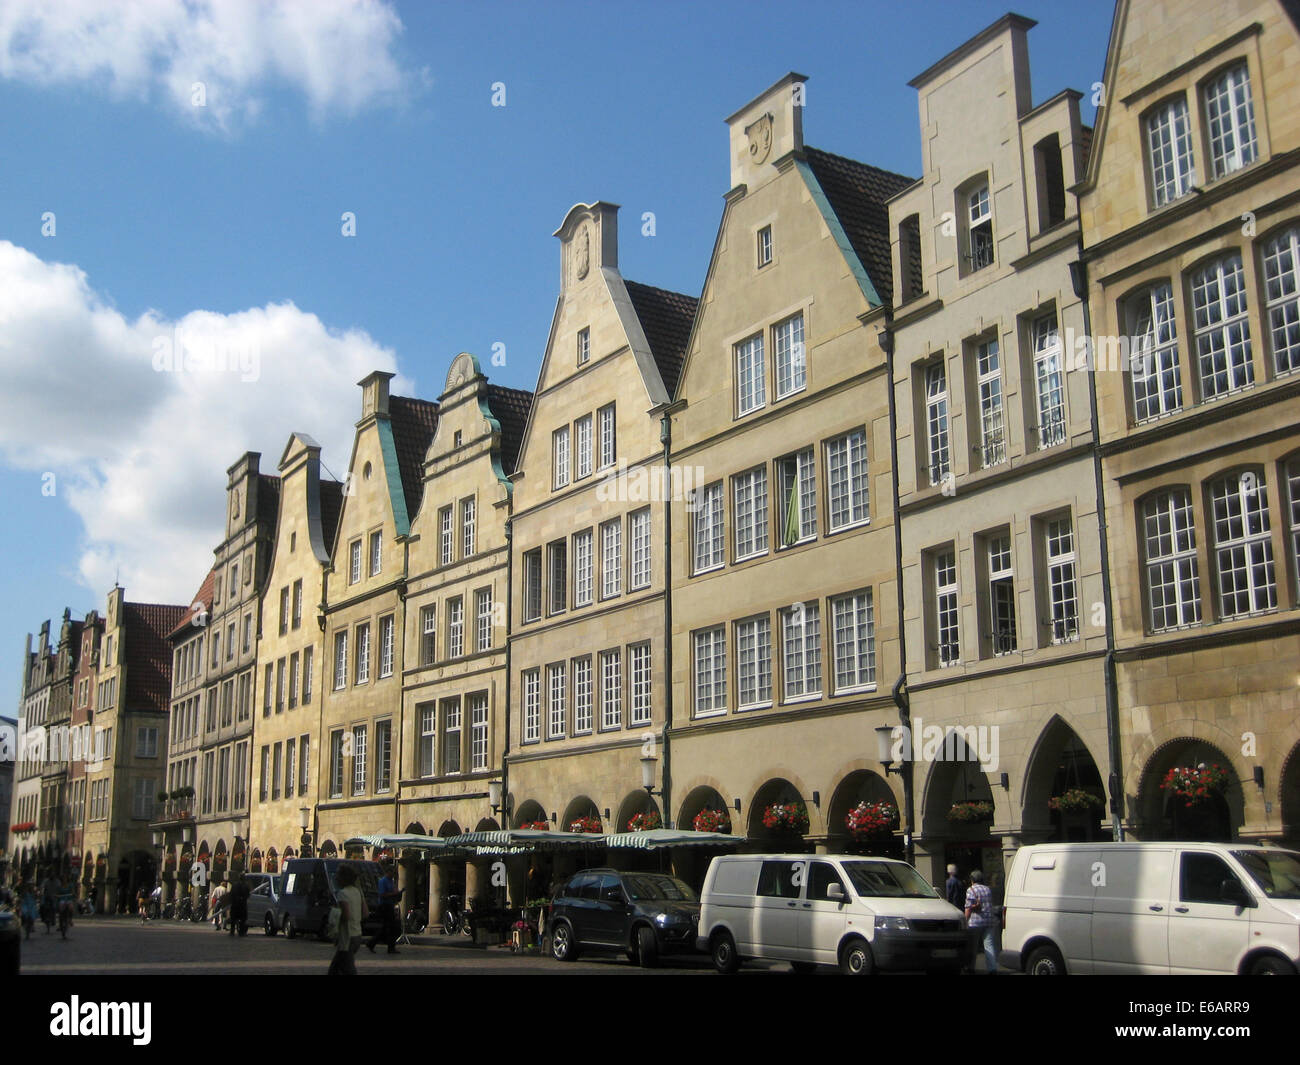 muenster,row of houses,prinzipalmarkt - Stock Image